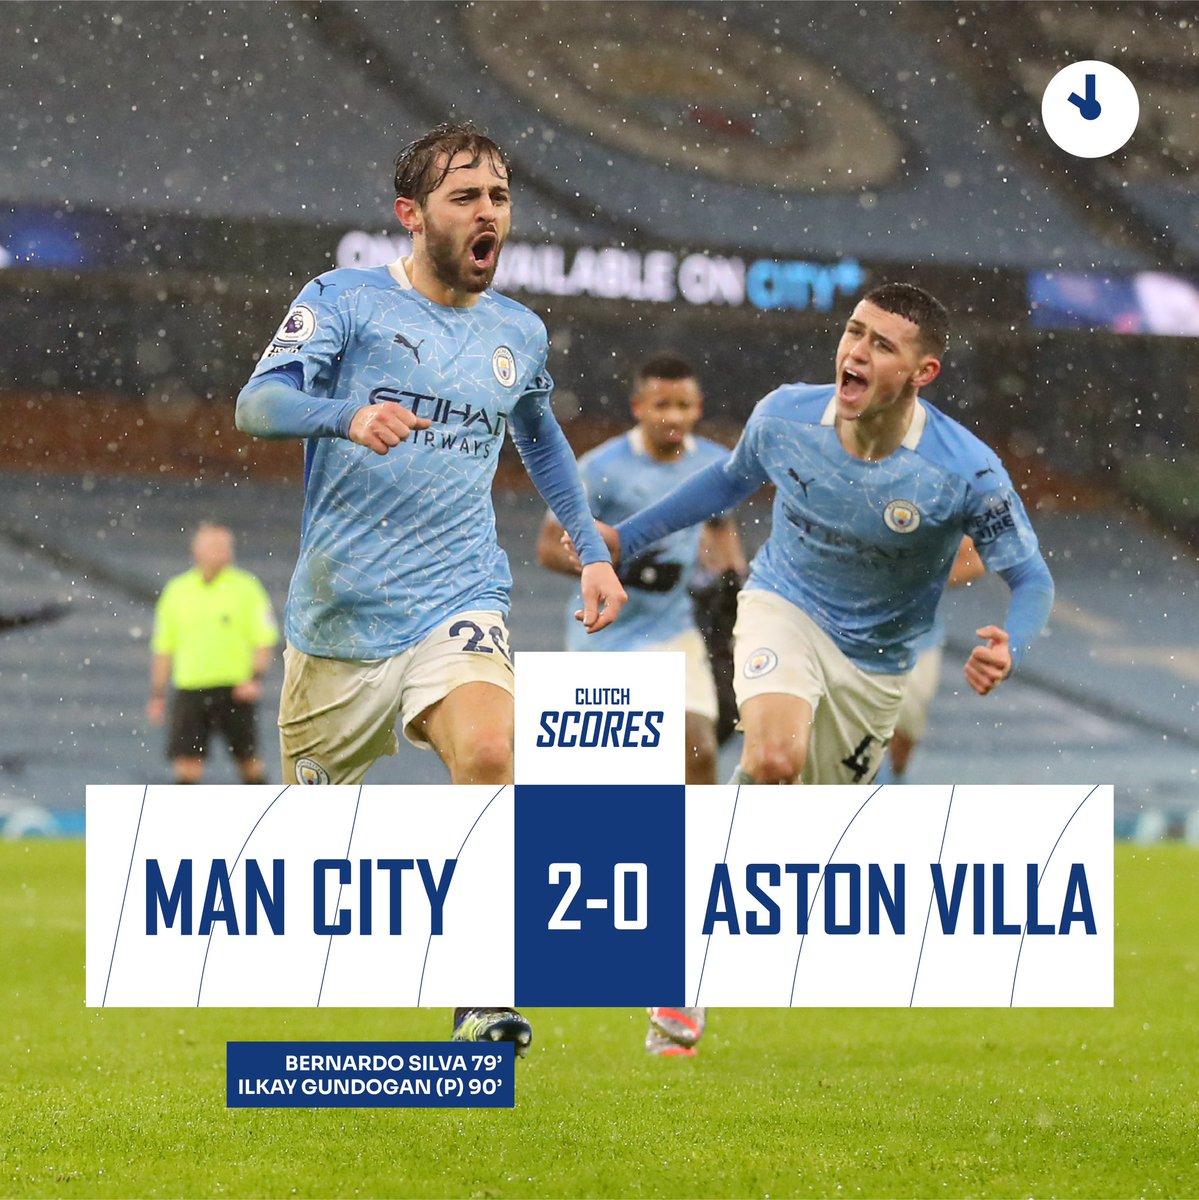 #ClutchScores  FT: Manchester City 2-0 Aston Villa  Dengan hasil ini The Citizens naik ke puncak klasemen sementara🔝  #MCIAVL #PremierLeague